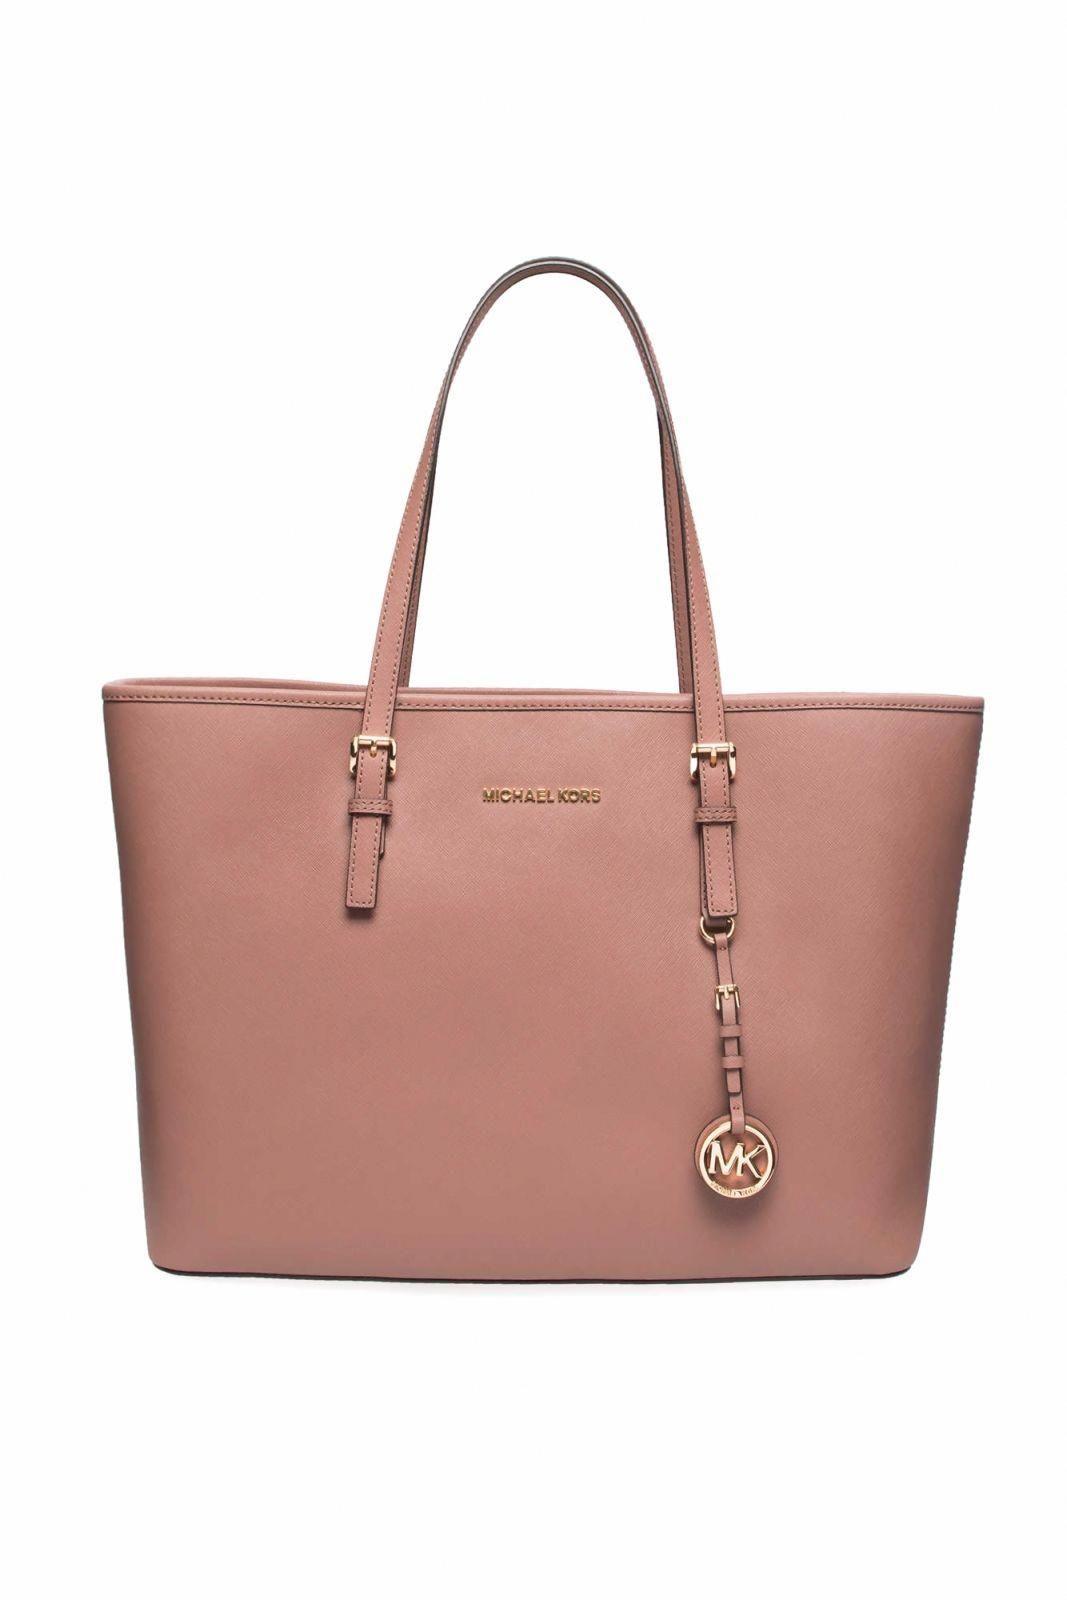 3d8bad9165f6 michael kors handbags clearance at macy s  Handbagsmichaelkors ...